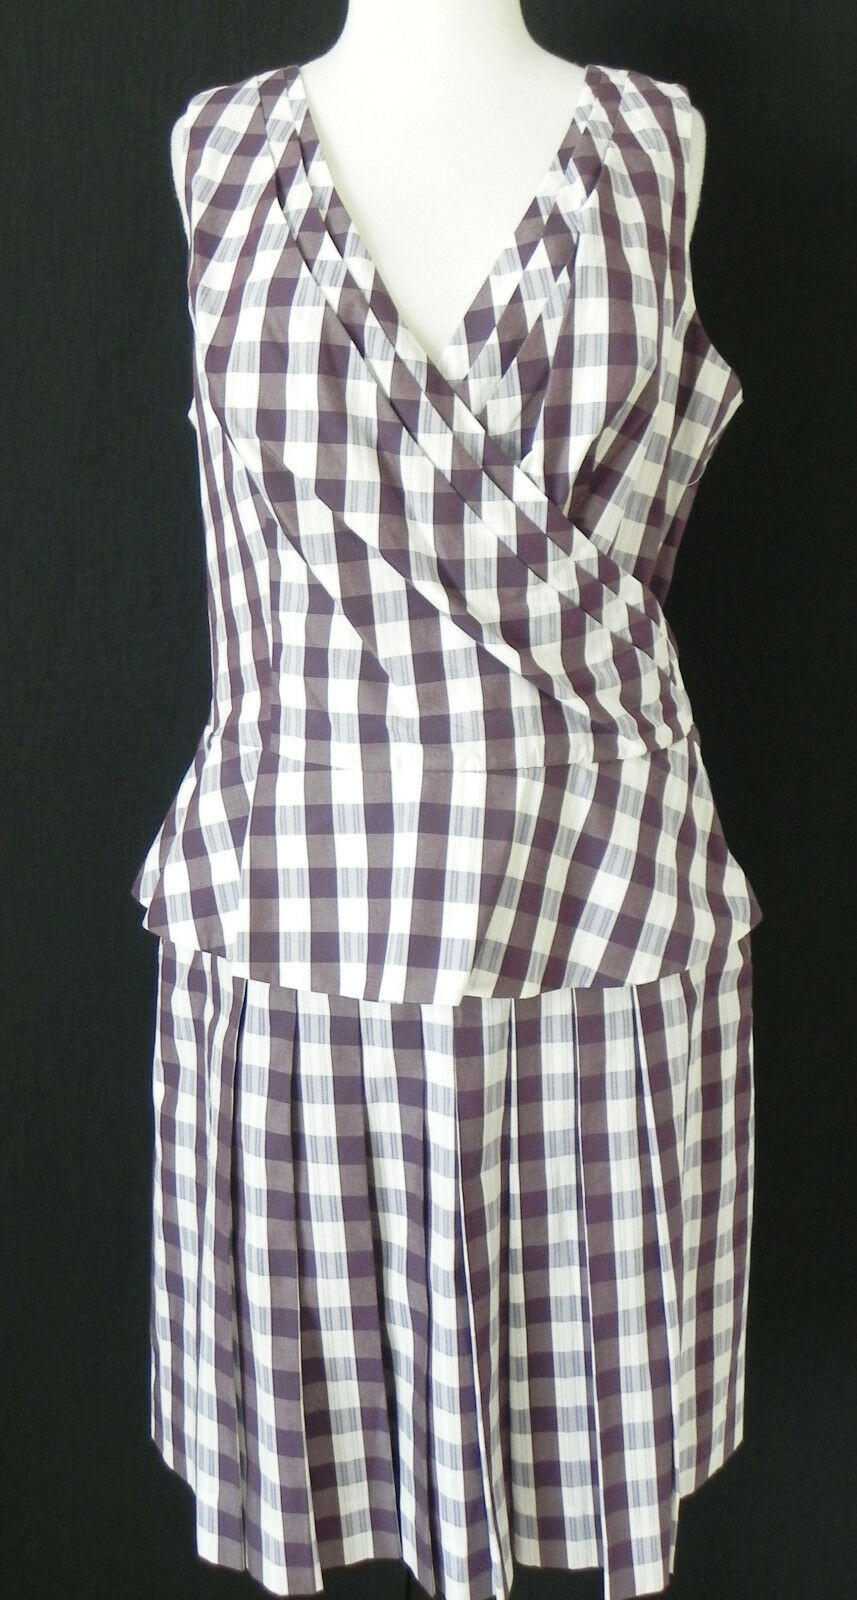 New Etcetera Skirt Suit Sleeveless Top Pleated Skirt Cotton Purple Size 12